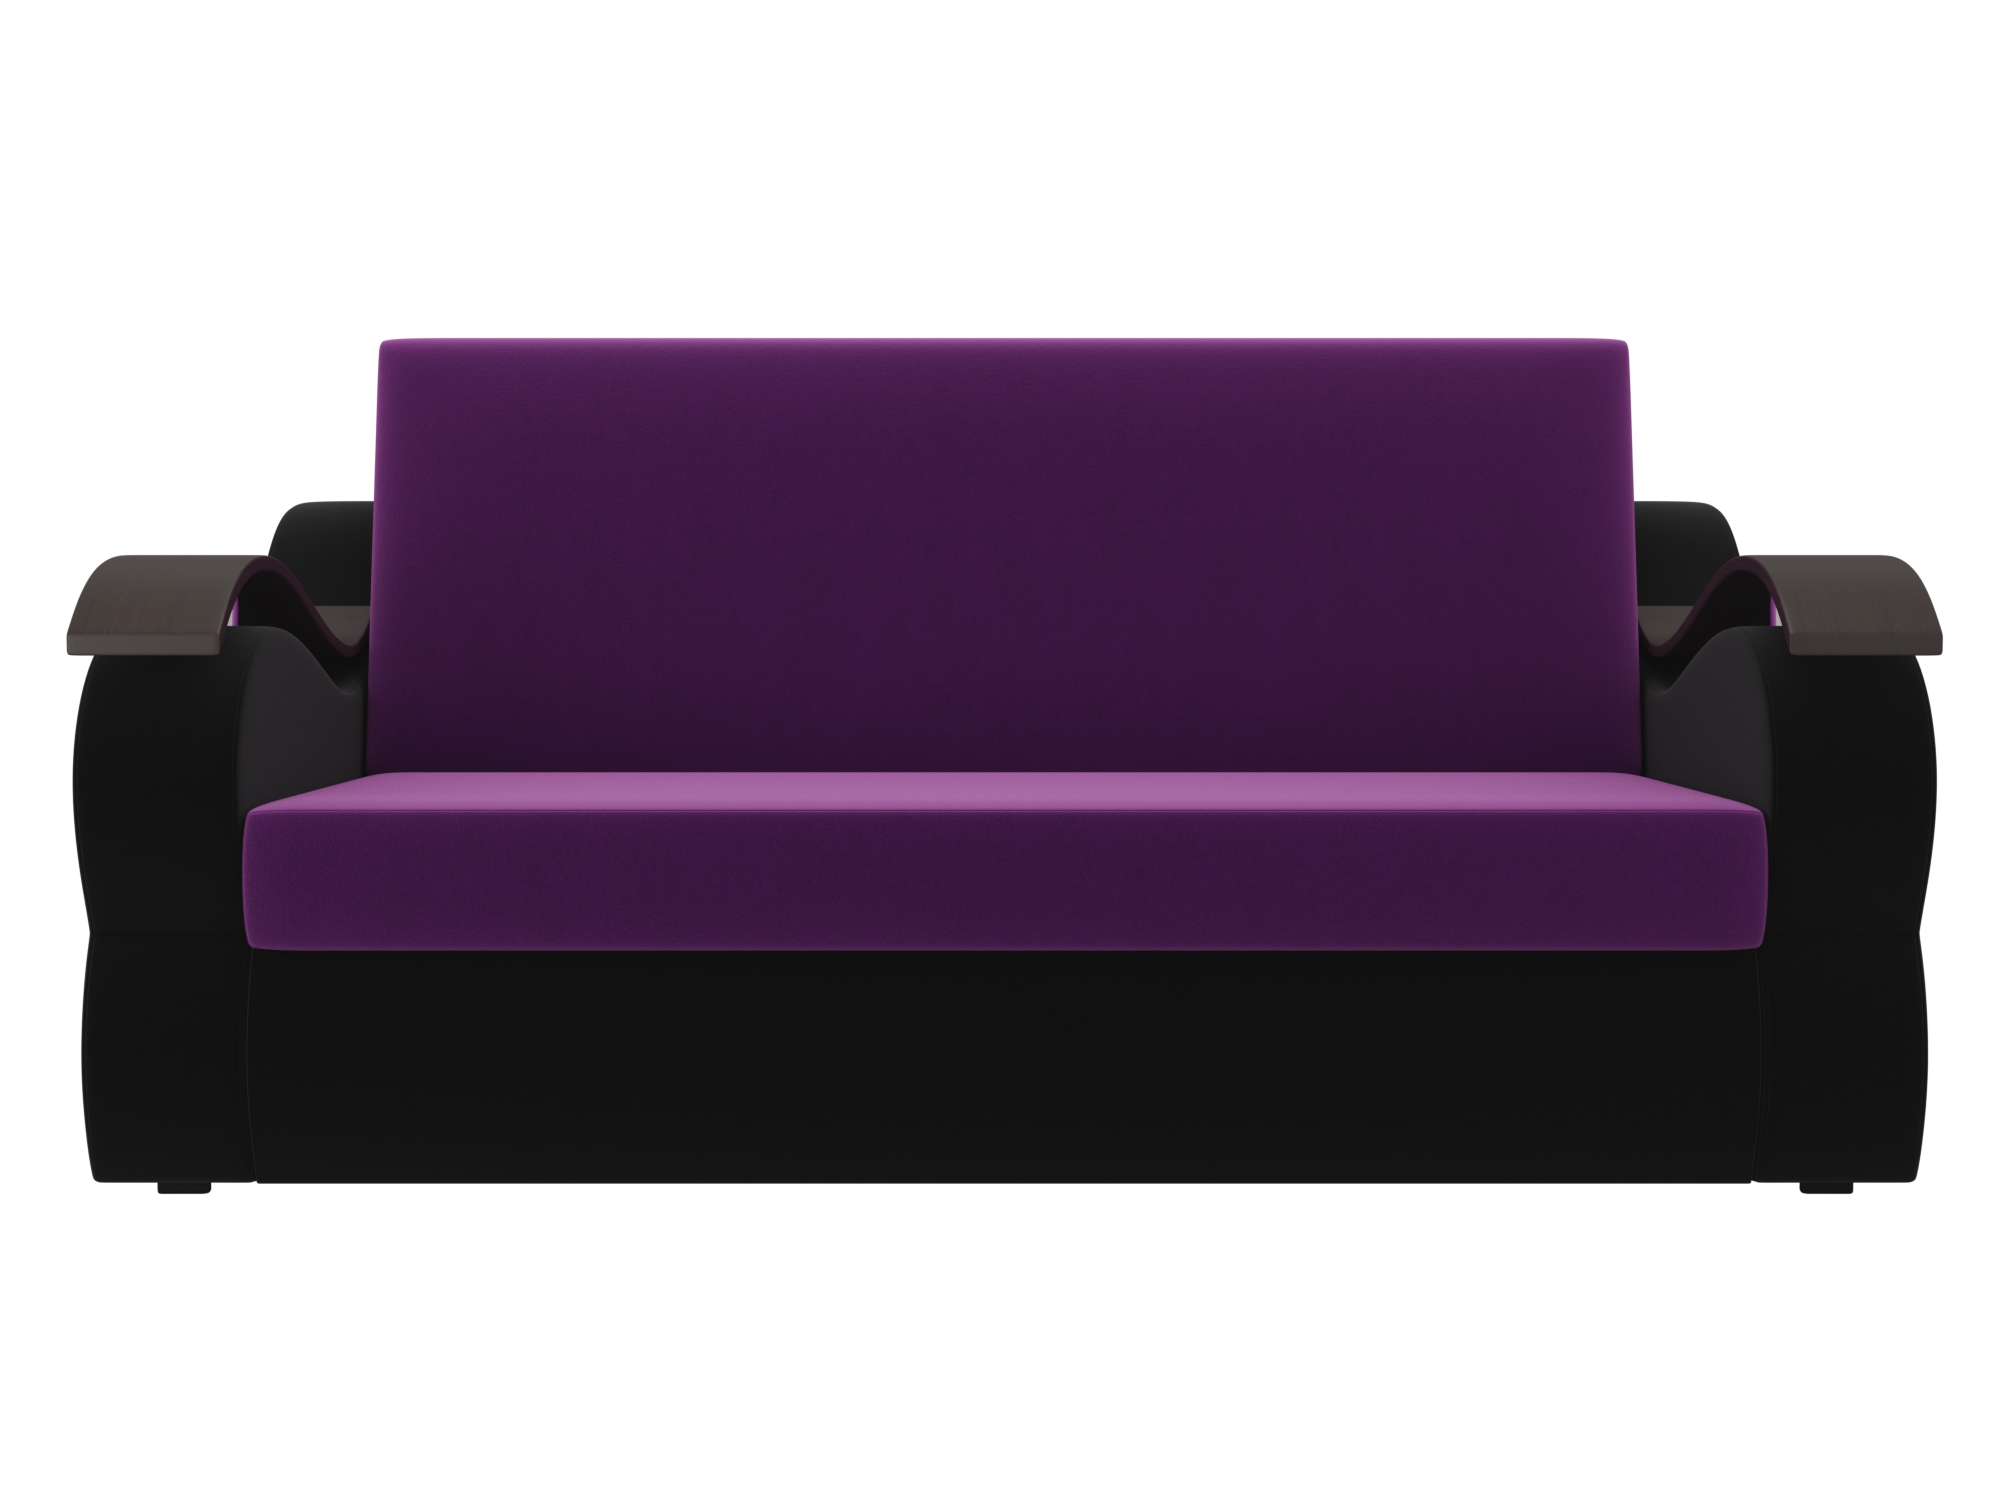 Диван Меркурий (140х190) MebelVia Фиолетовый, Черный